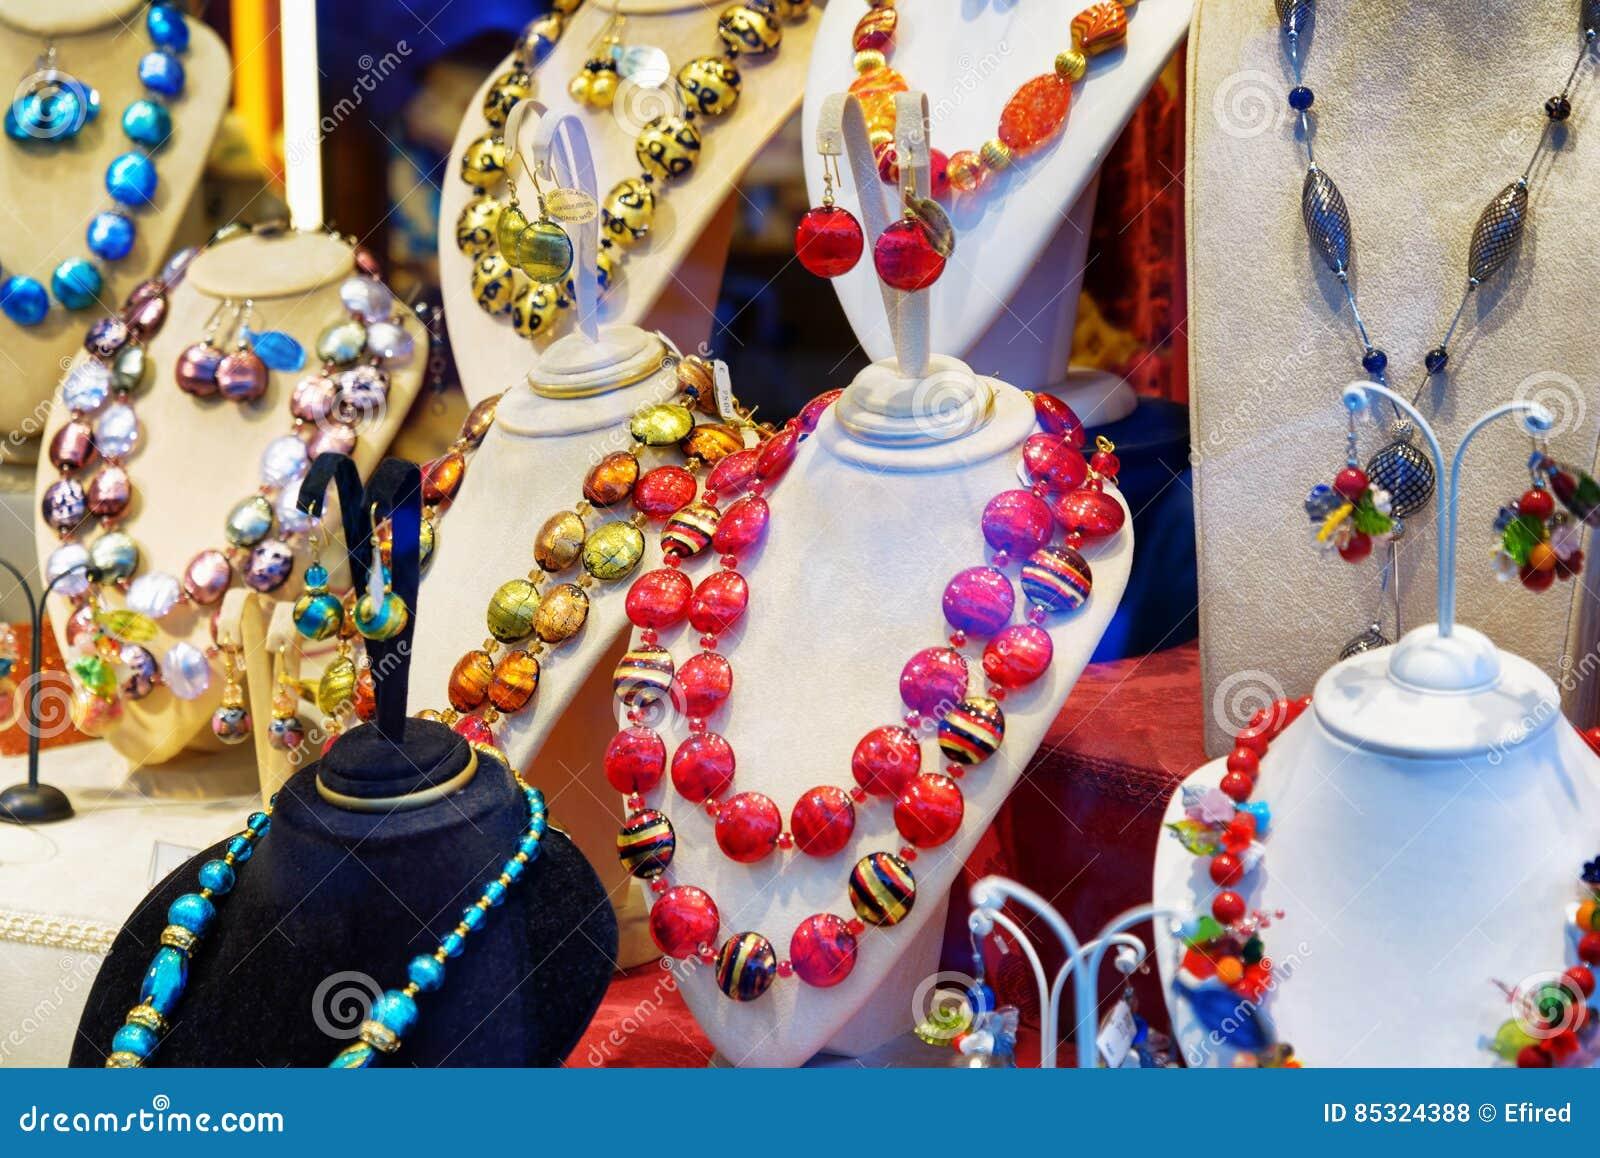 cf30173b7ad1 Original Jewelry From Murano Glass In Shop Window